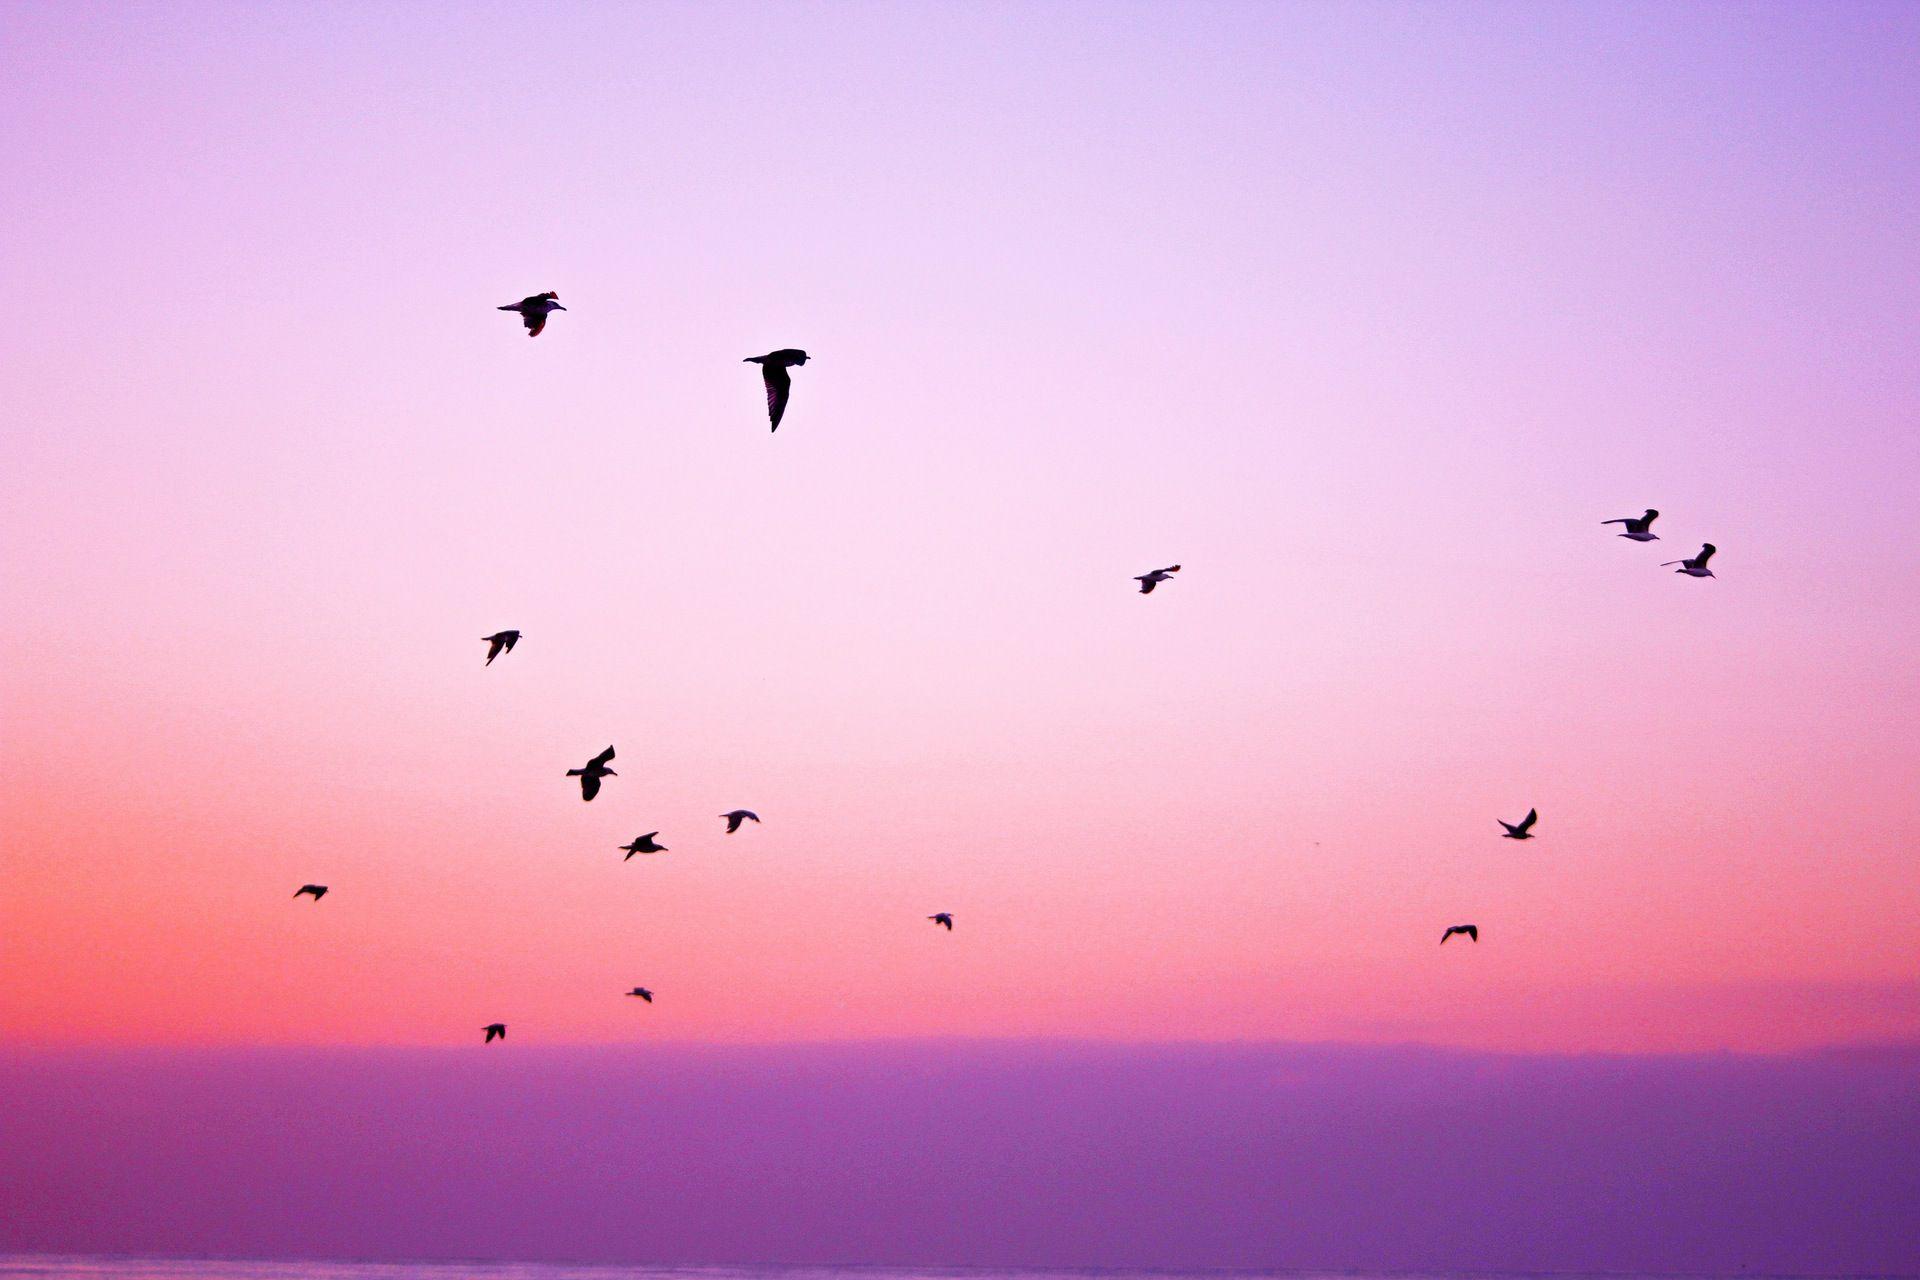 pájaros, cielo, libertad, rosa, morado - Fondos de Pantalla HD ...